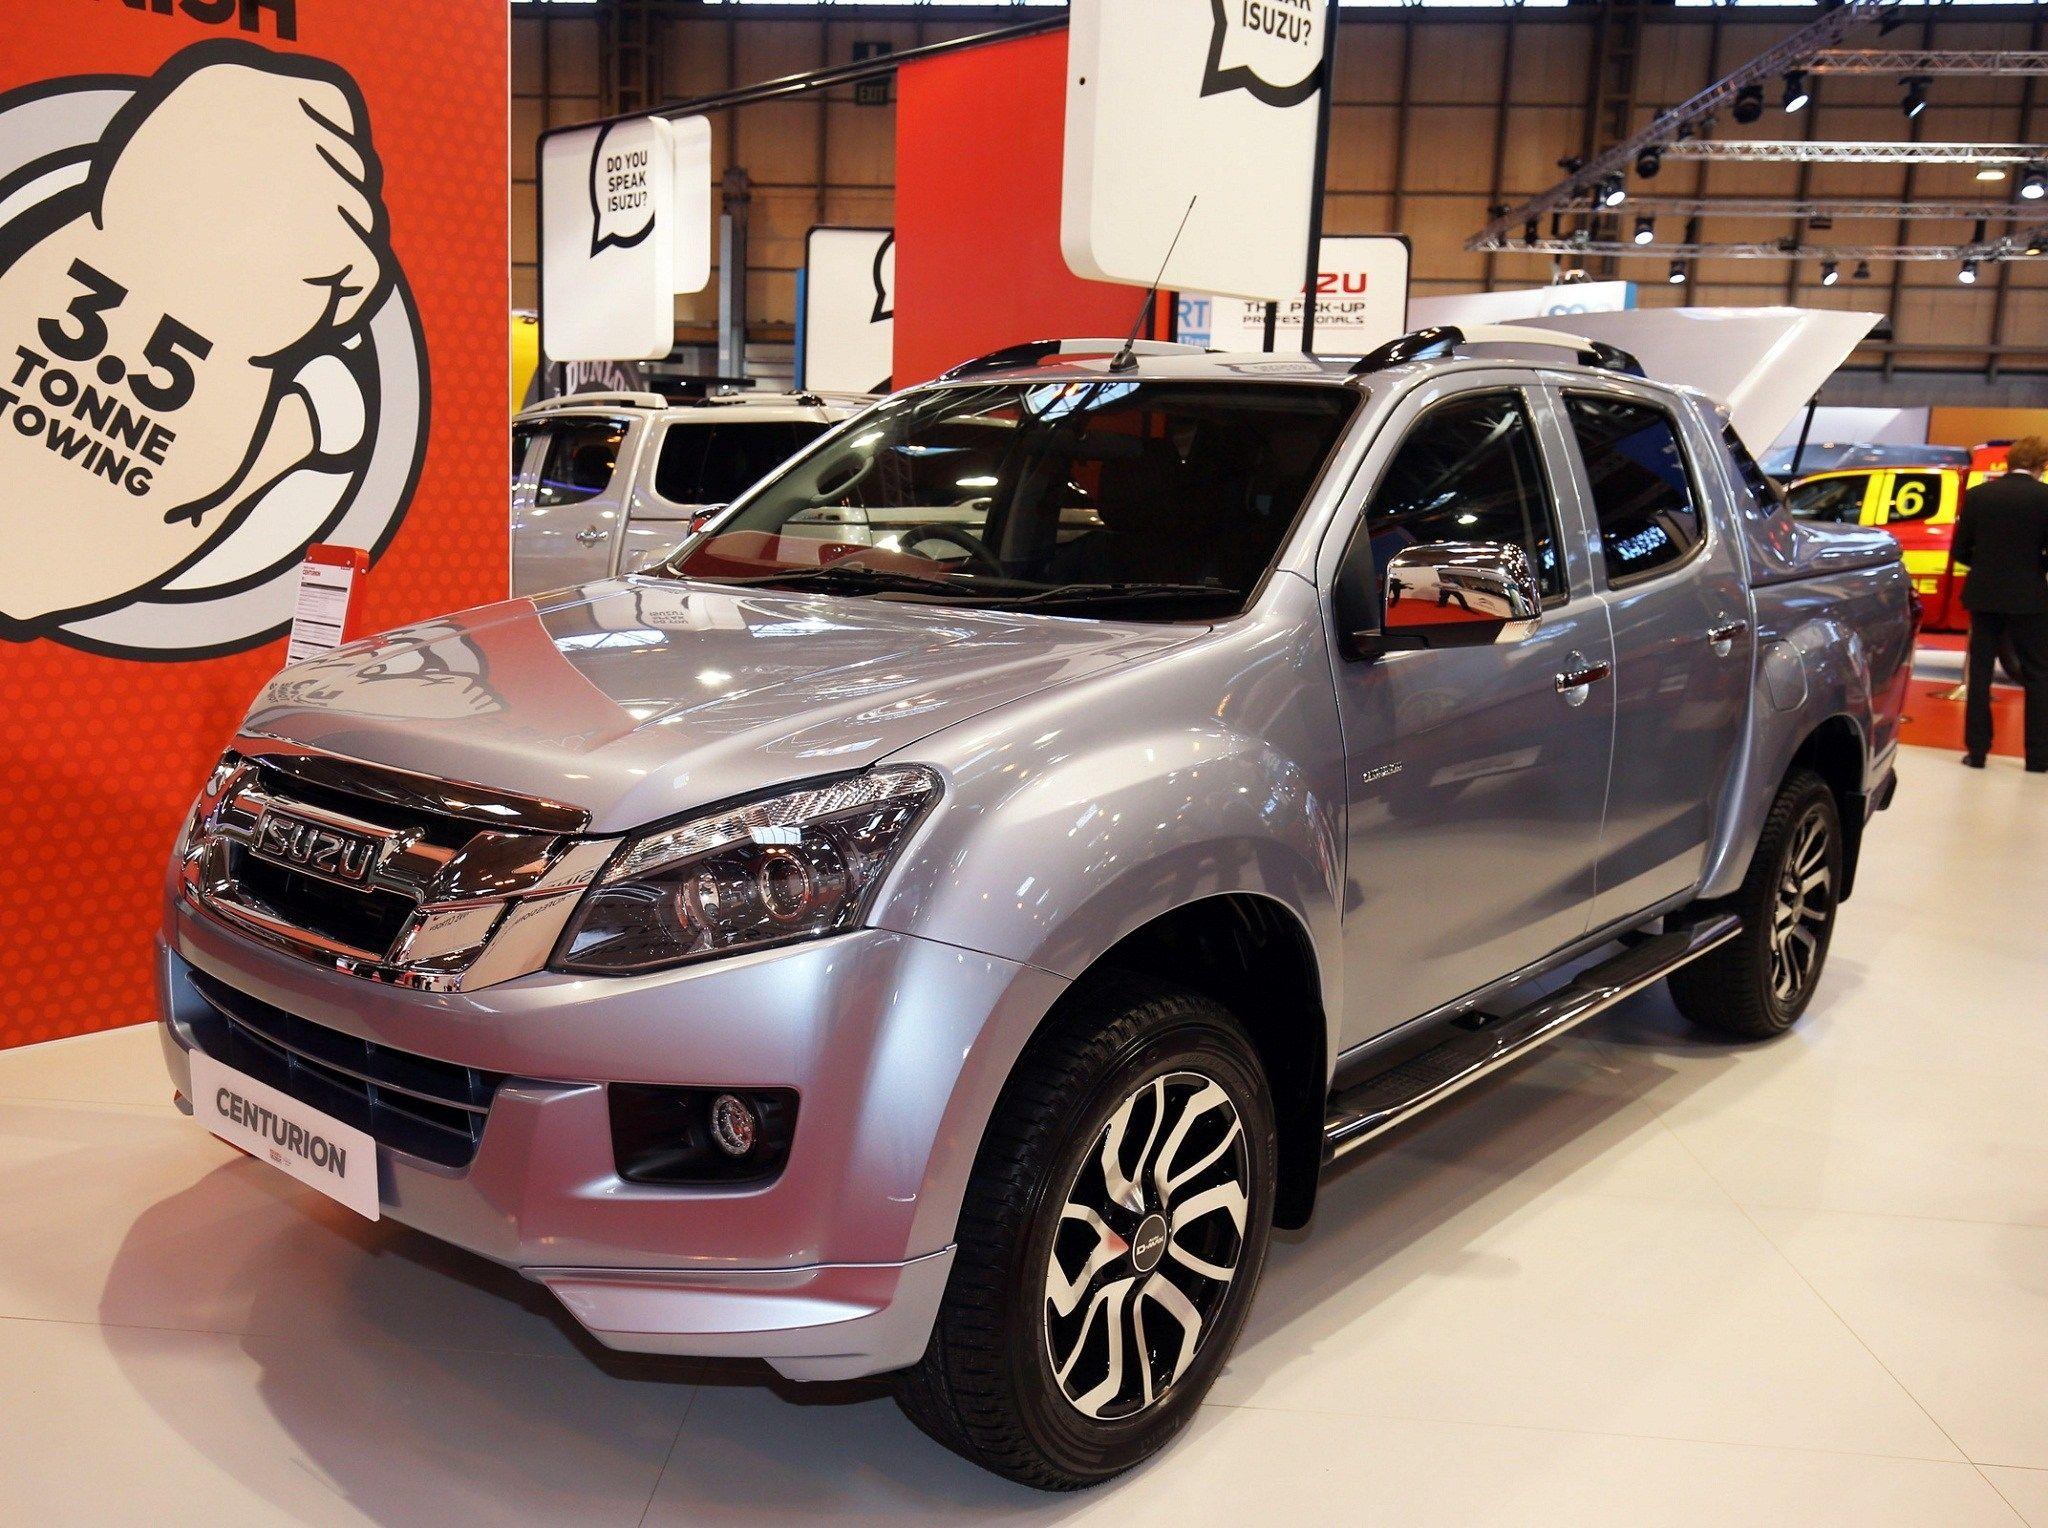 2020 Isuzu MUX Review and Specs Car, New pickup trucks